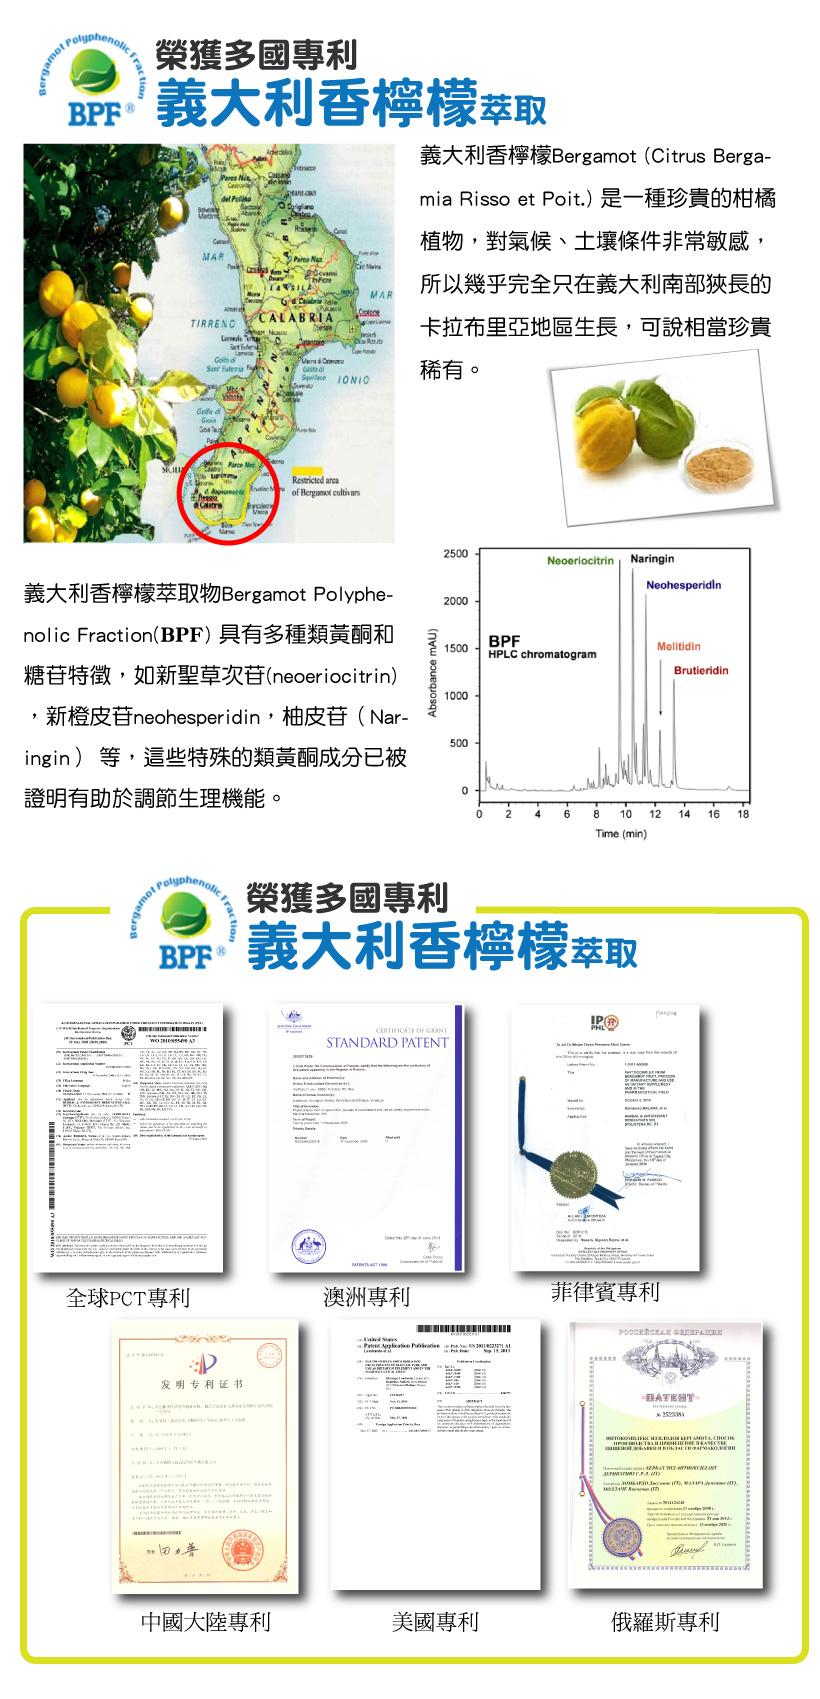 BPF義大利香檸檬,多國專利